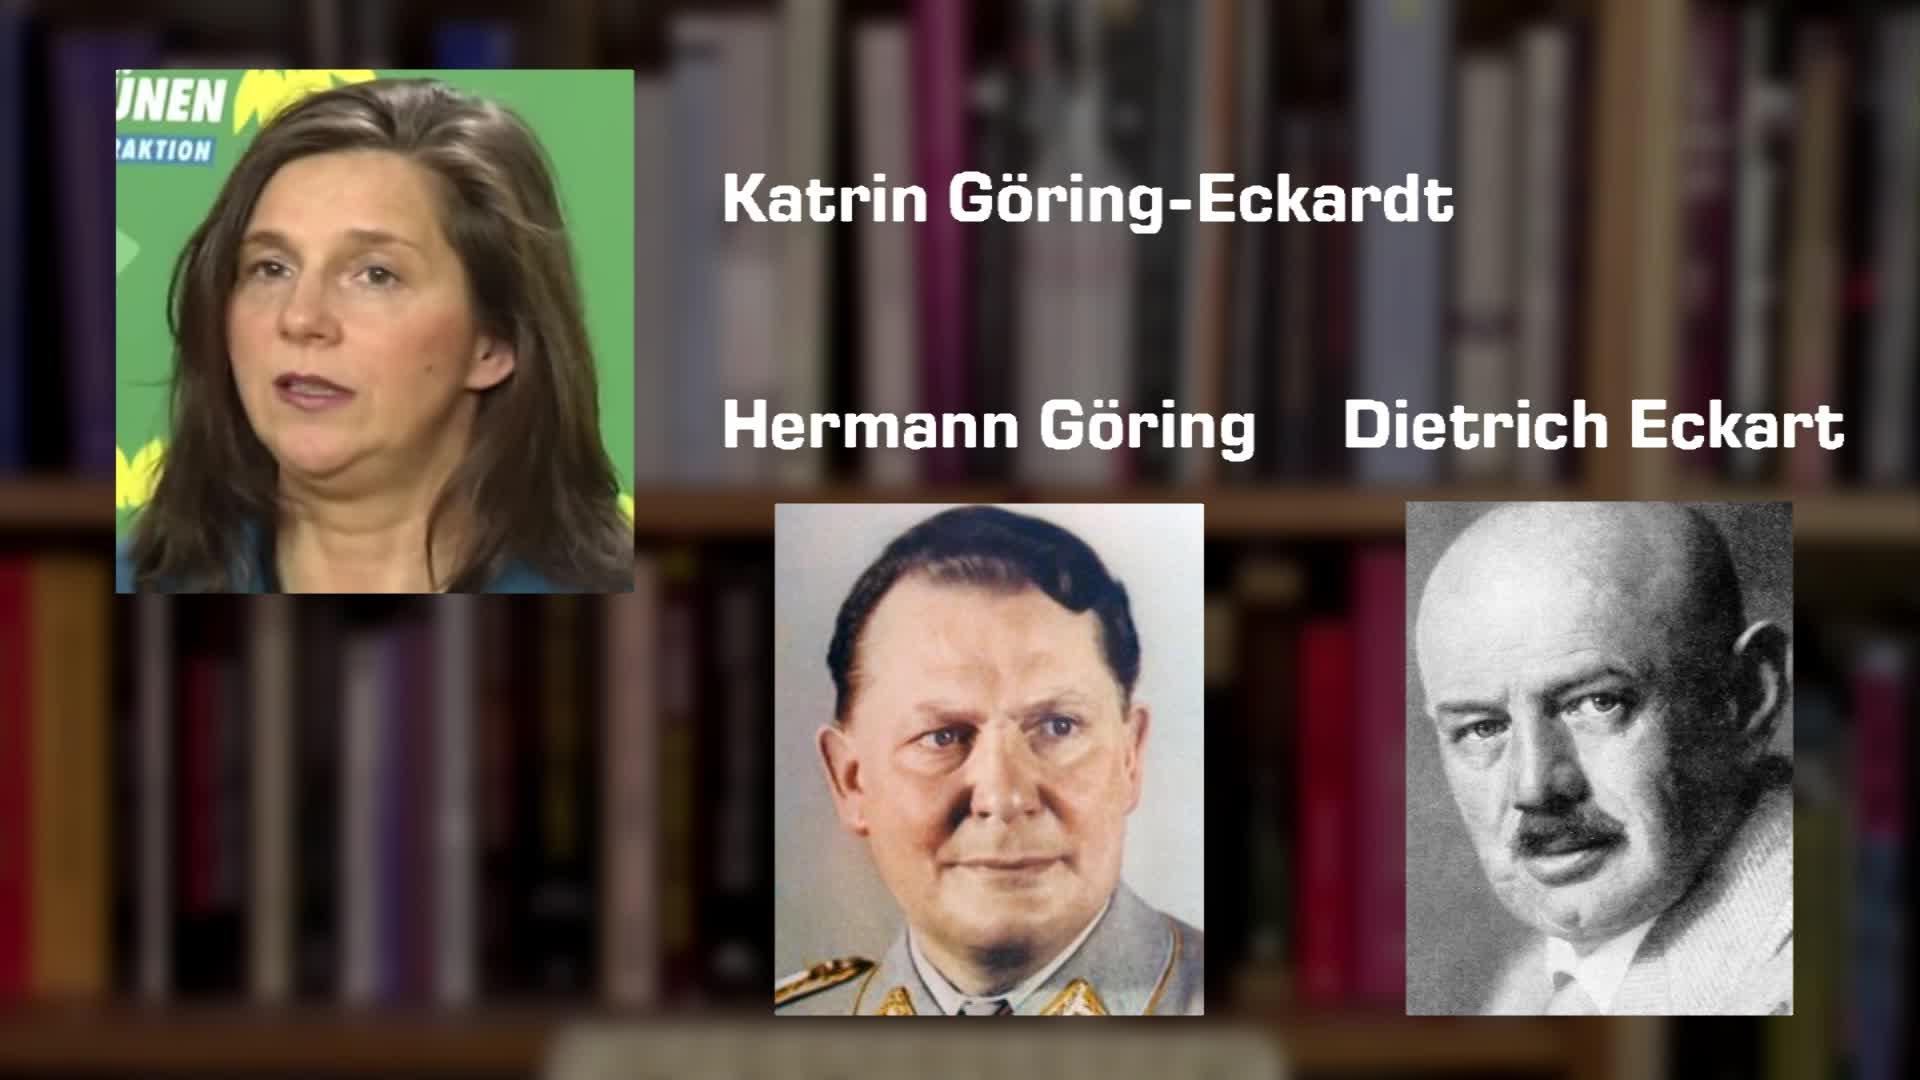 Katrin Göring-Eckardt - Hermann Göring - Dietrich Eckart